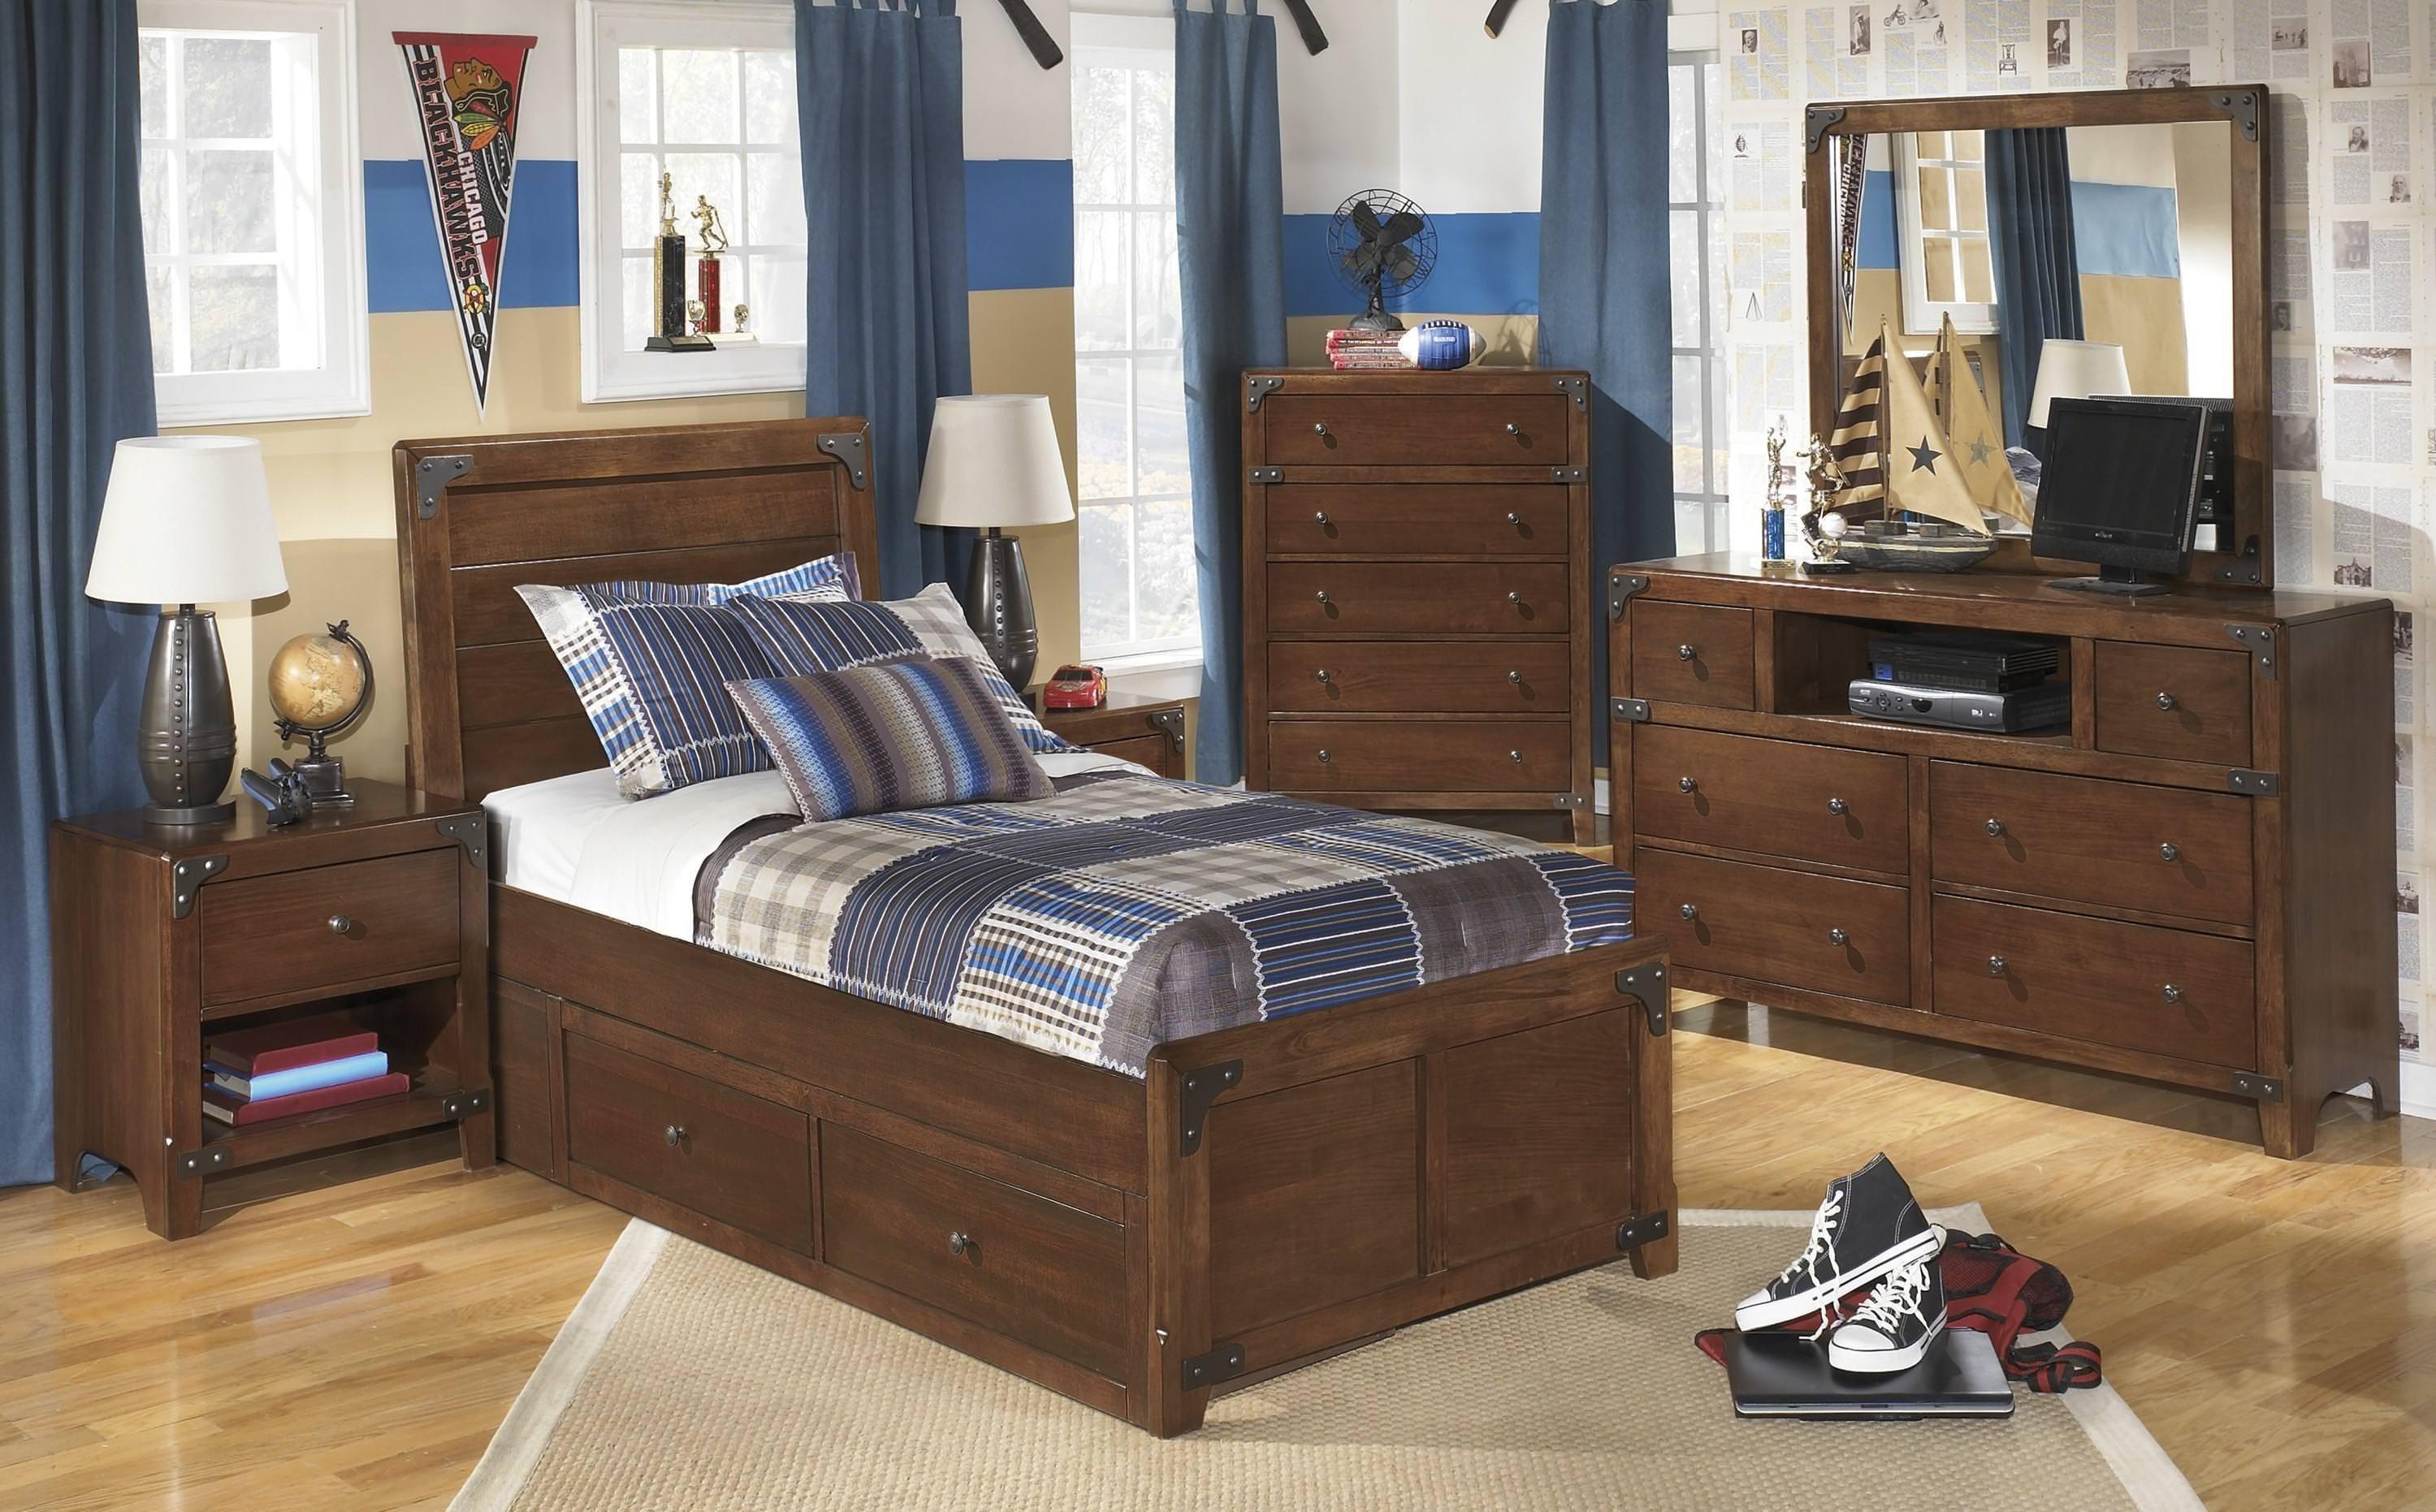 Ashley Furniture Kids Bedroom Luxury Kids Furniture Bedroom Sets Conquistarunamujer